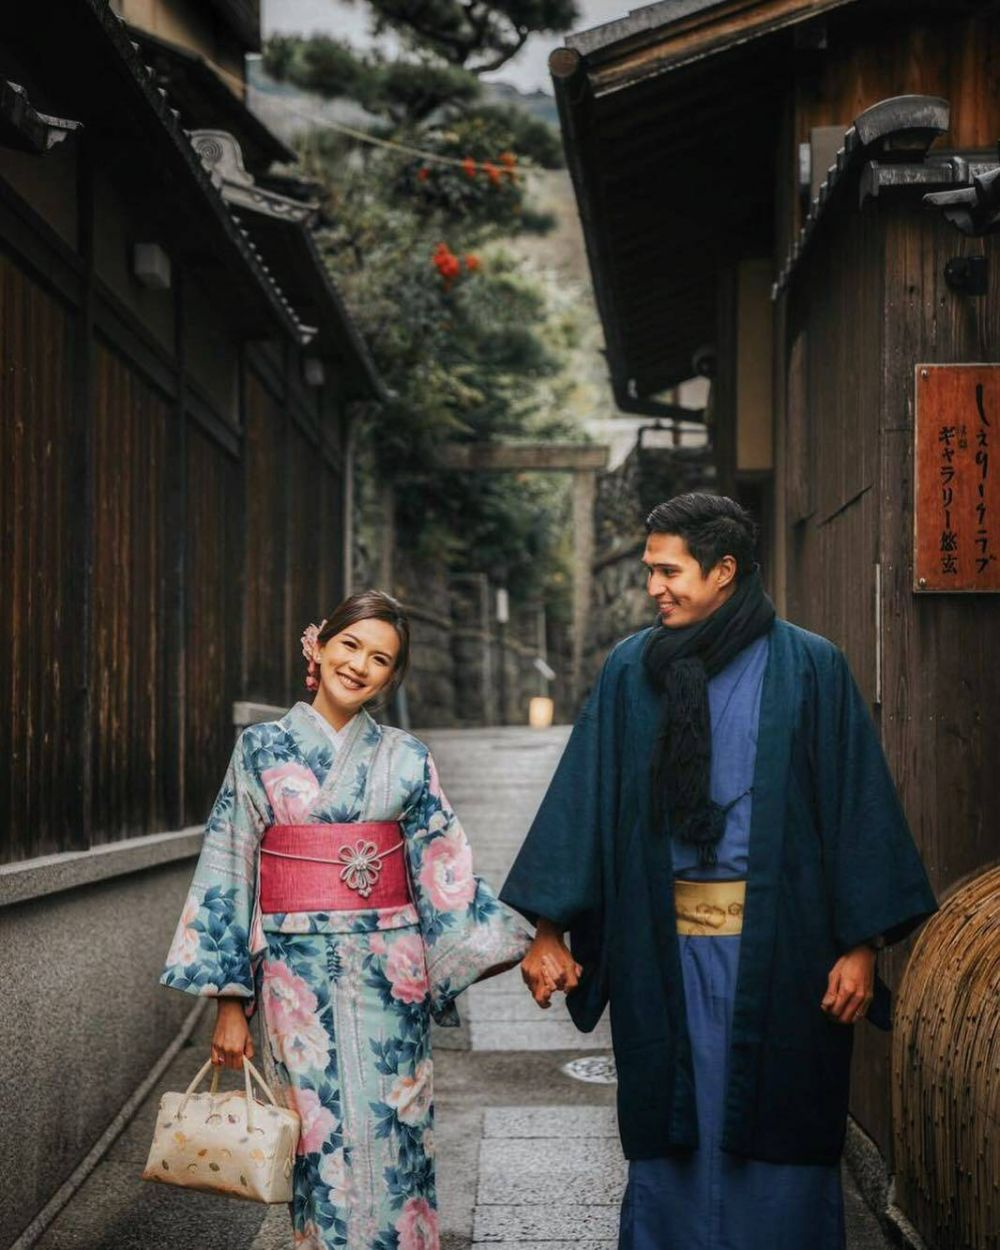 Potret pasangan seleb dalam balutan Kimono Instagram